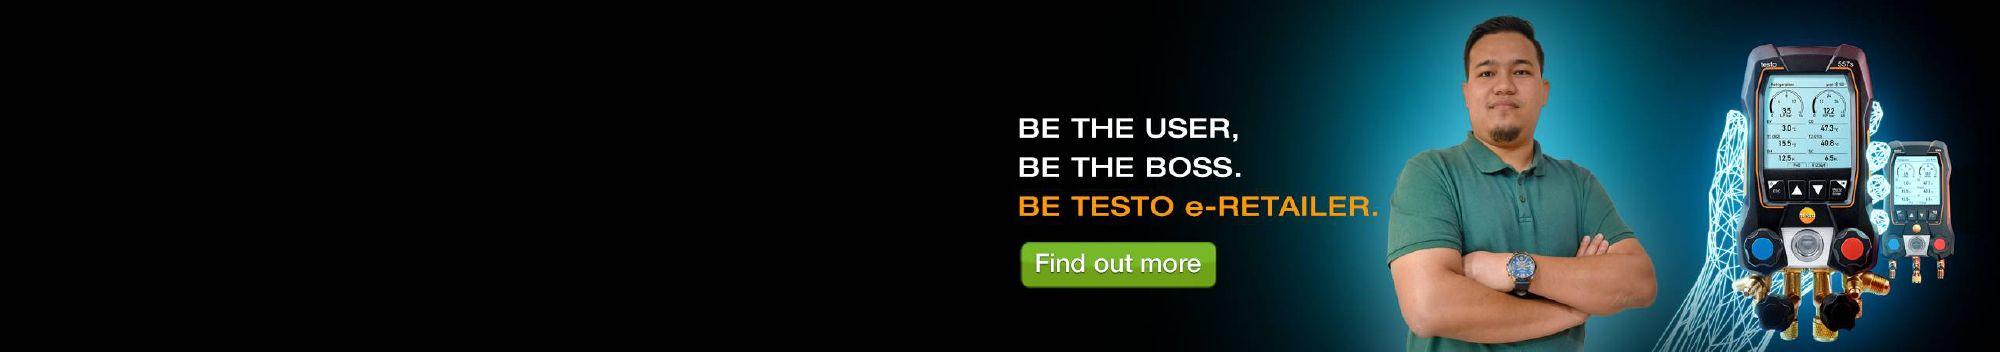 Sign up and become <br /><b>Testo e-Retailer.</b>